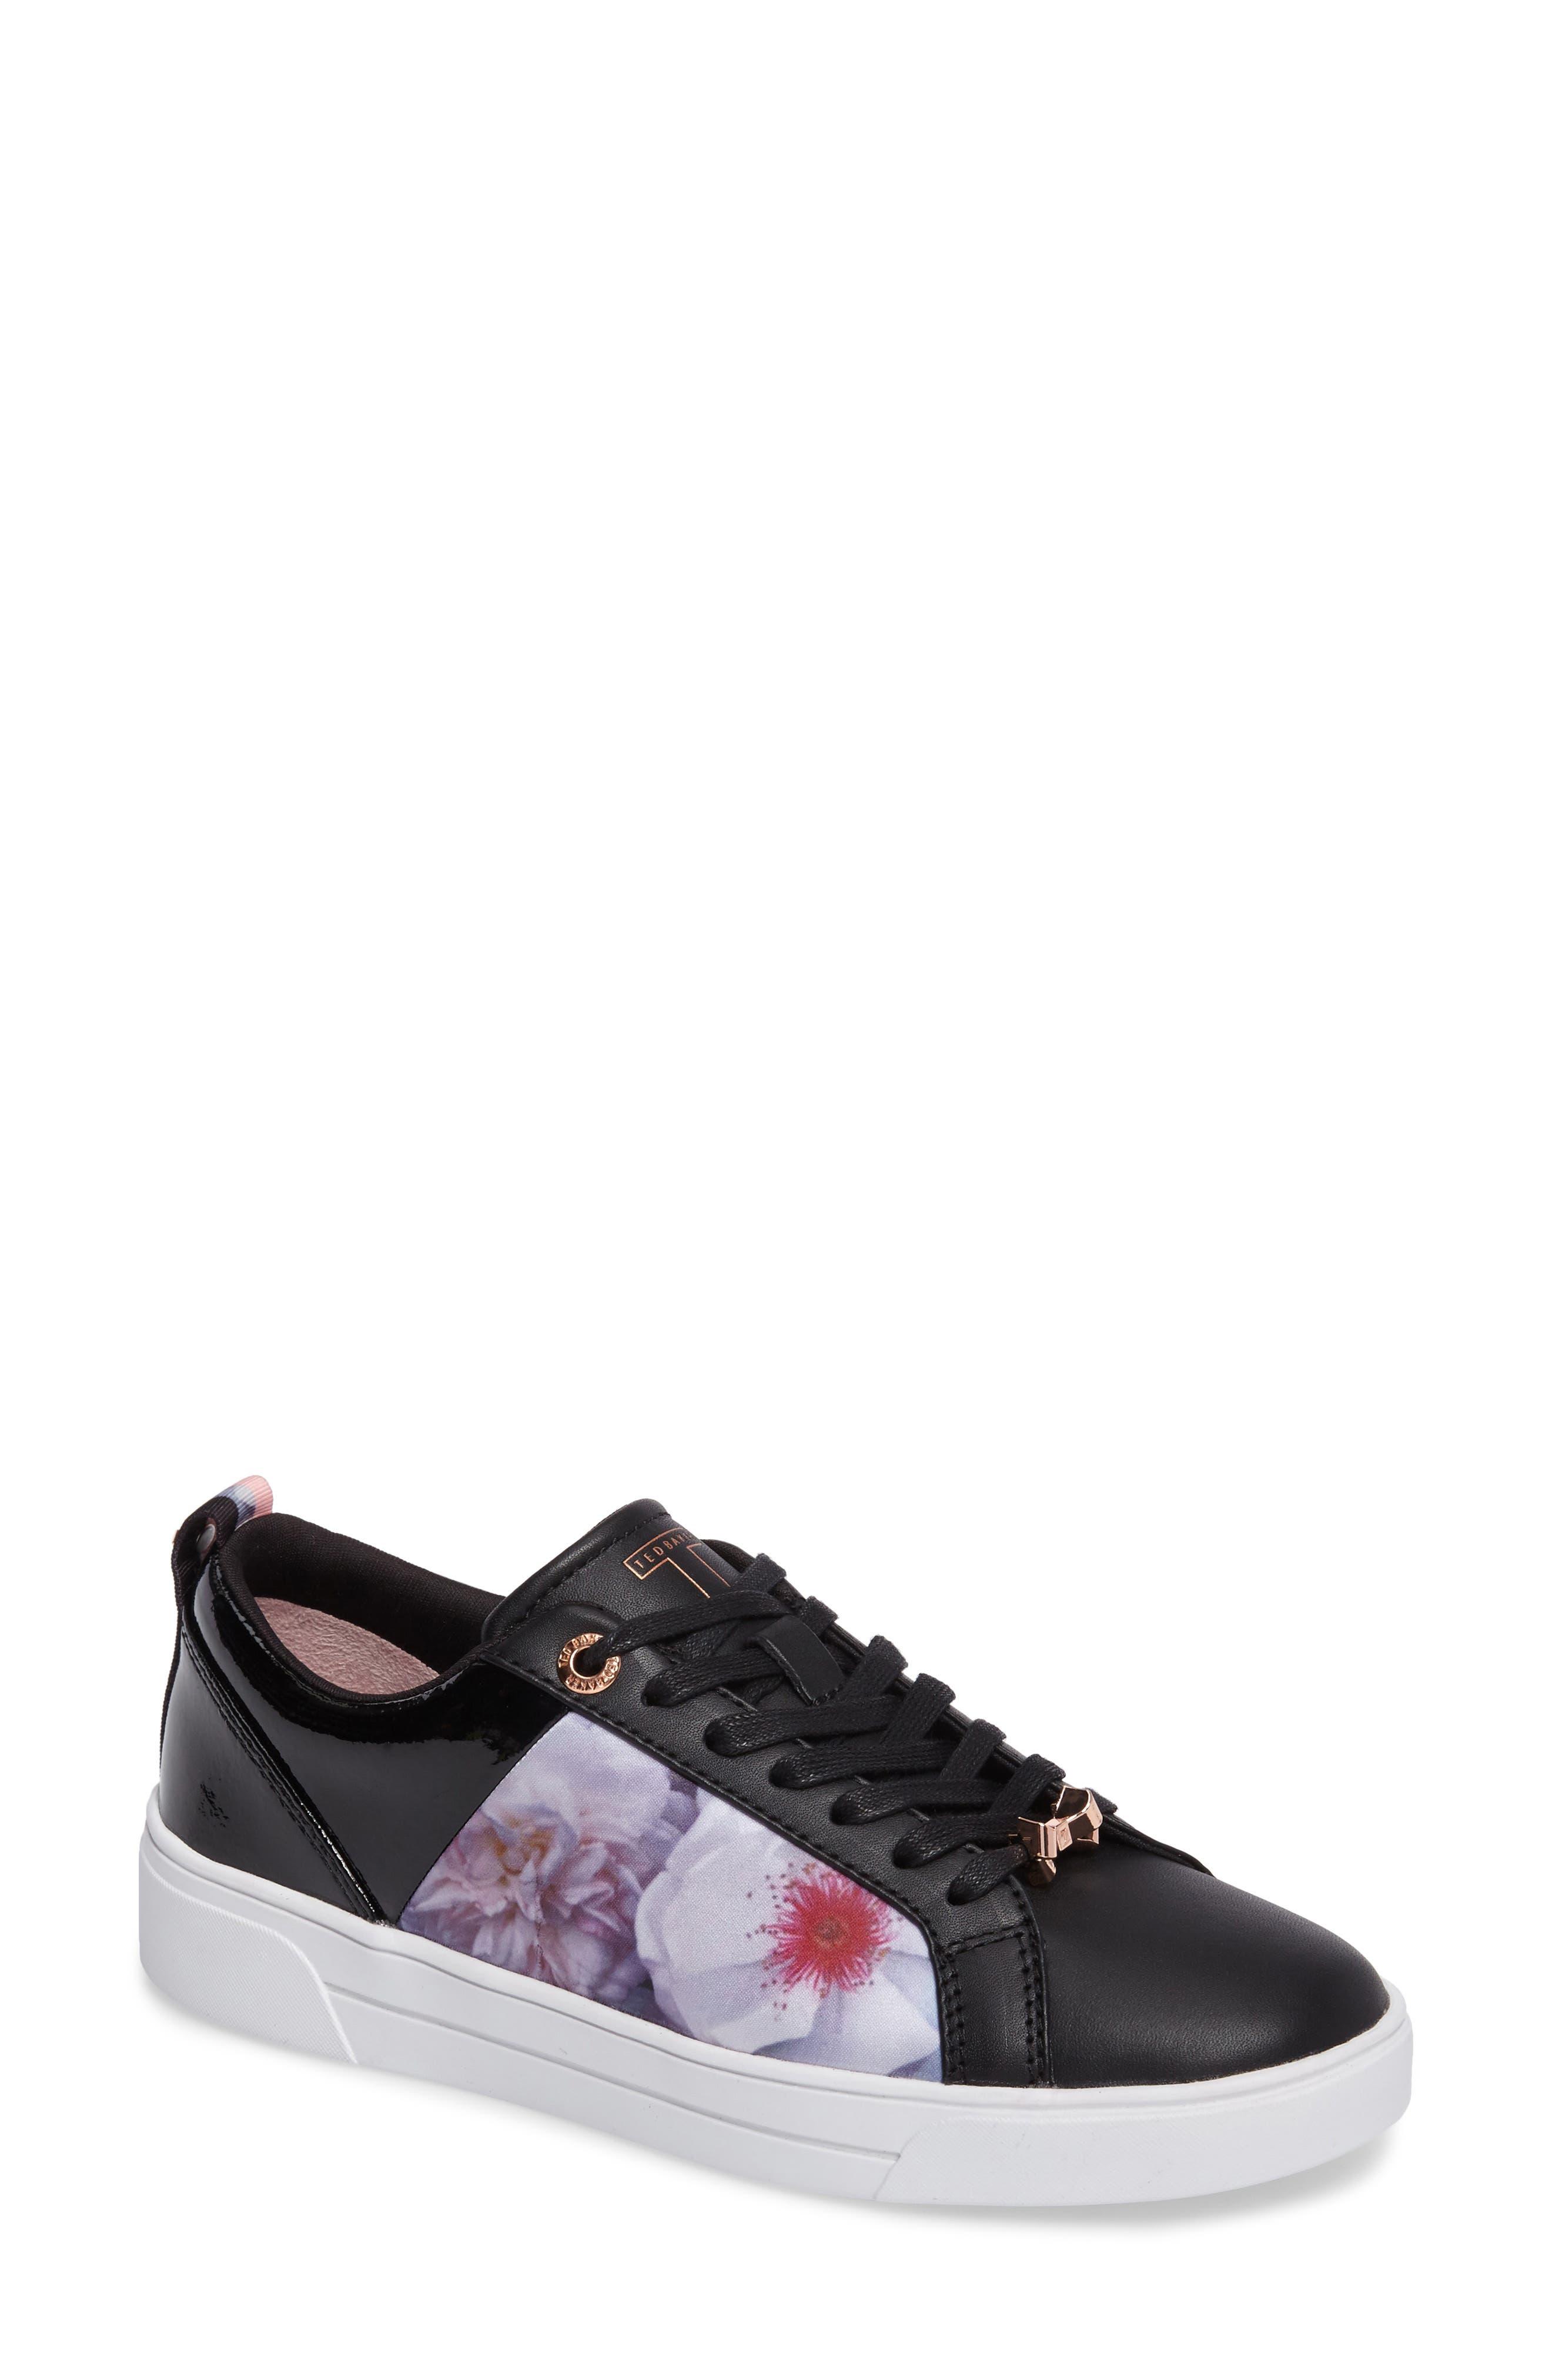 Fushar Sneaker,                         Main,                         color, 001